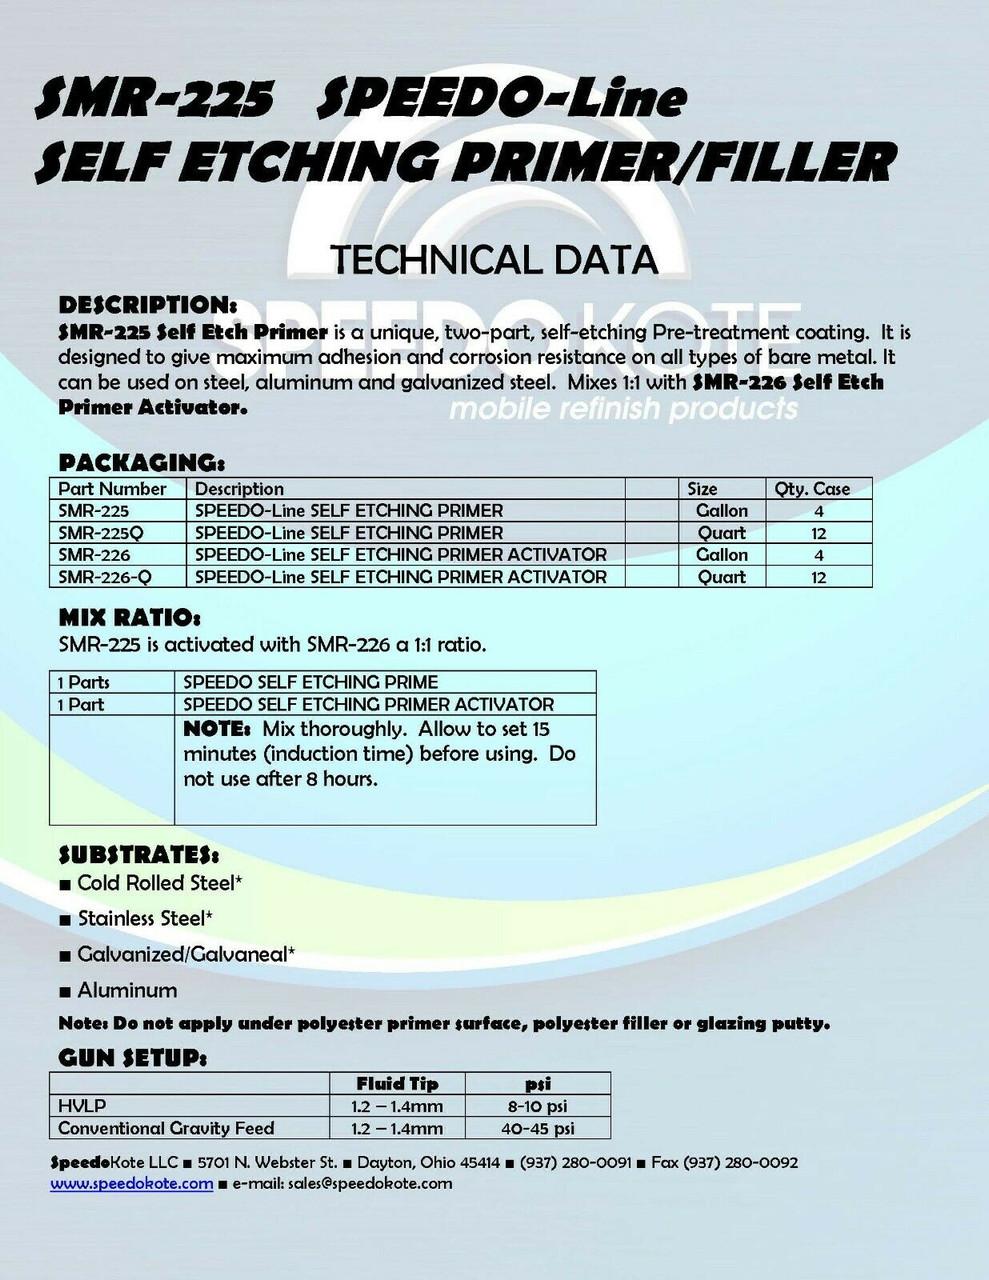 Self Etching Green/Gray Primer, Quart Kit , SMR-225/226-Q